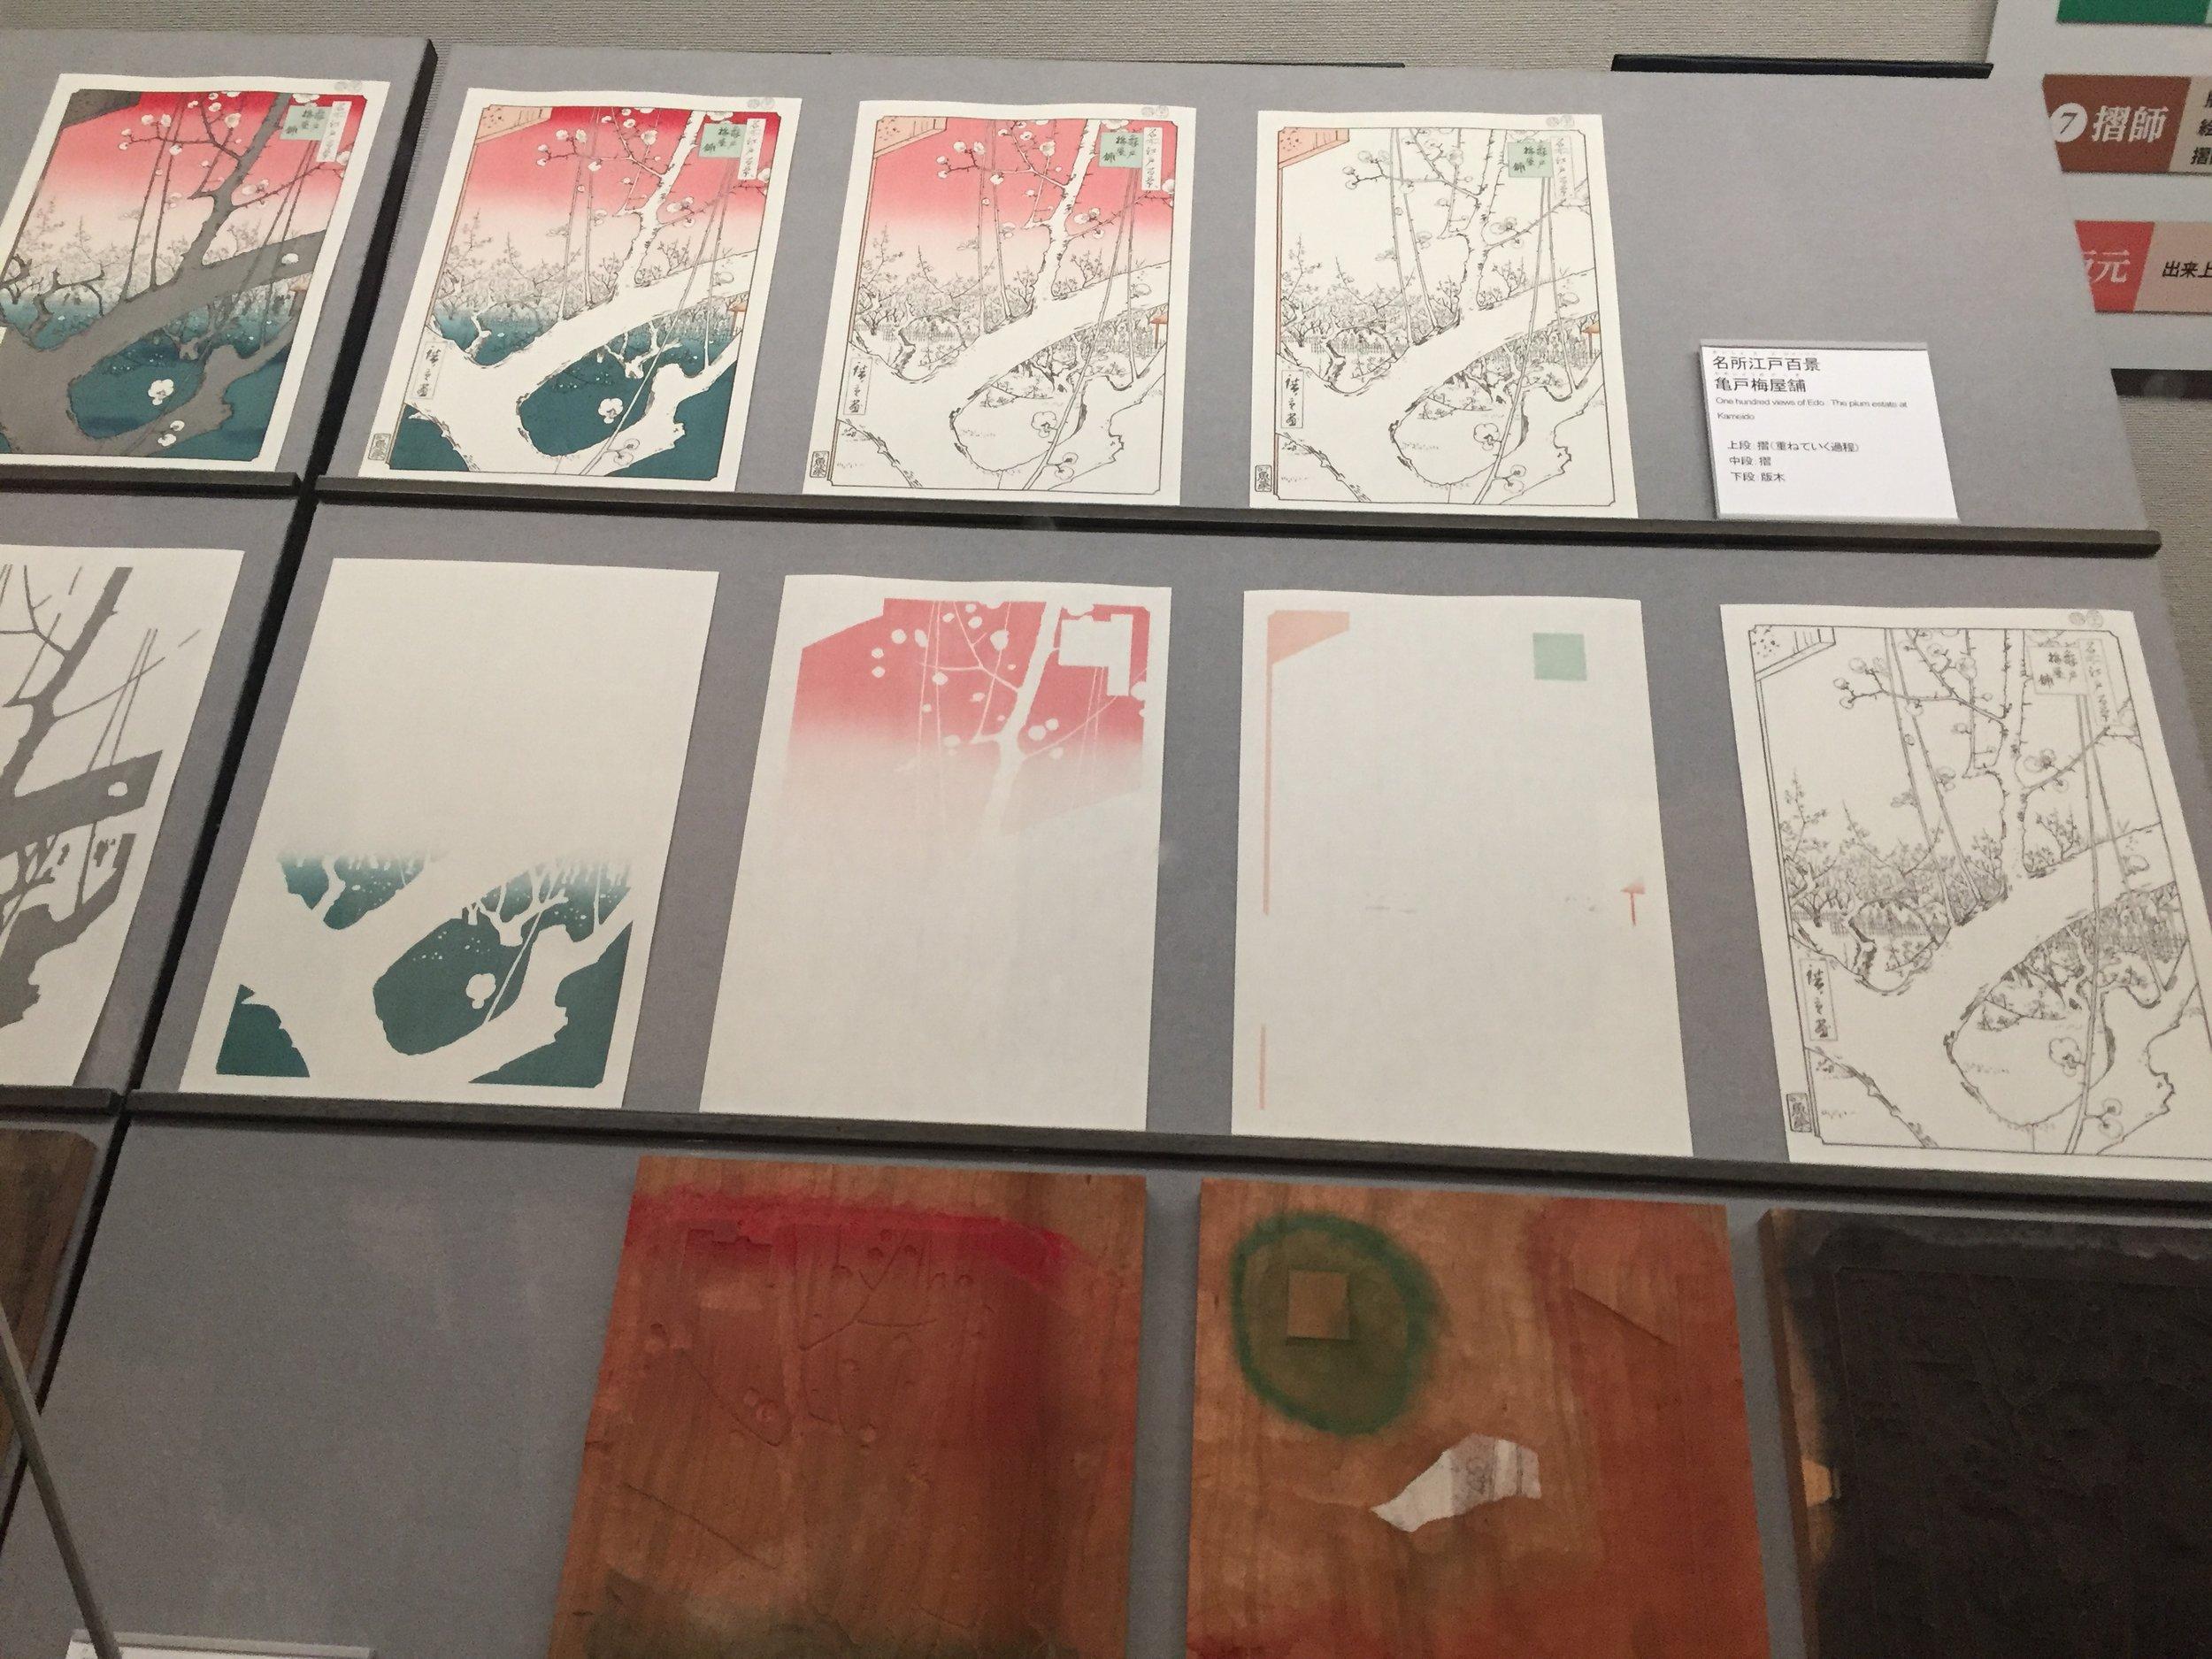 Wood block printing proccess - Edo Museum, Tokyo